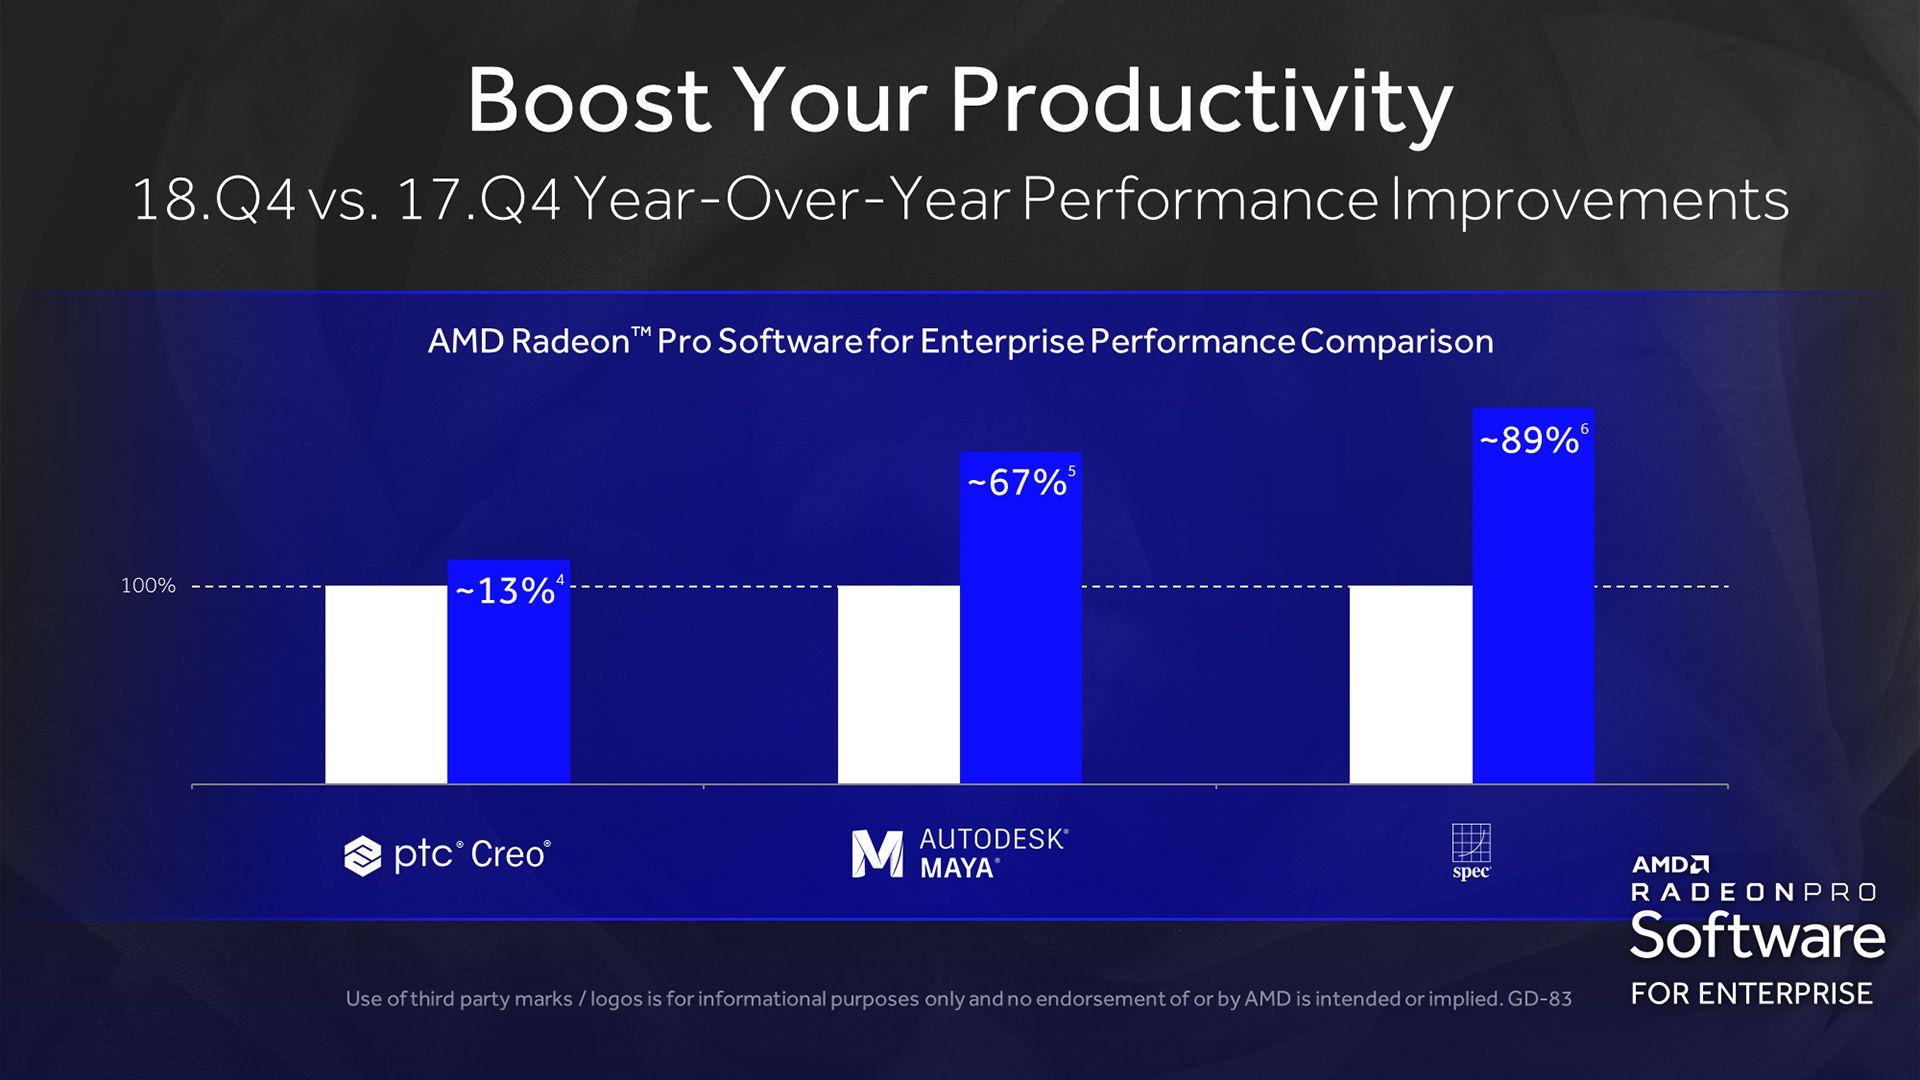 Radeon Pro Software for Enterprise 18.Q4